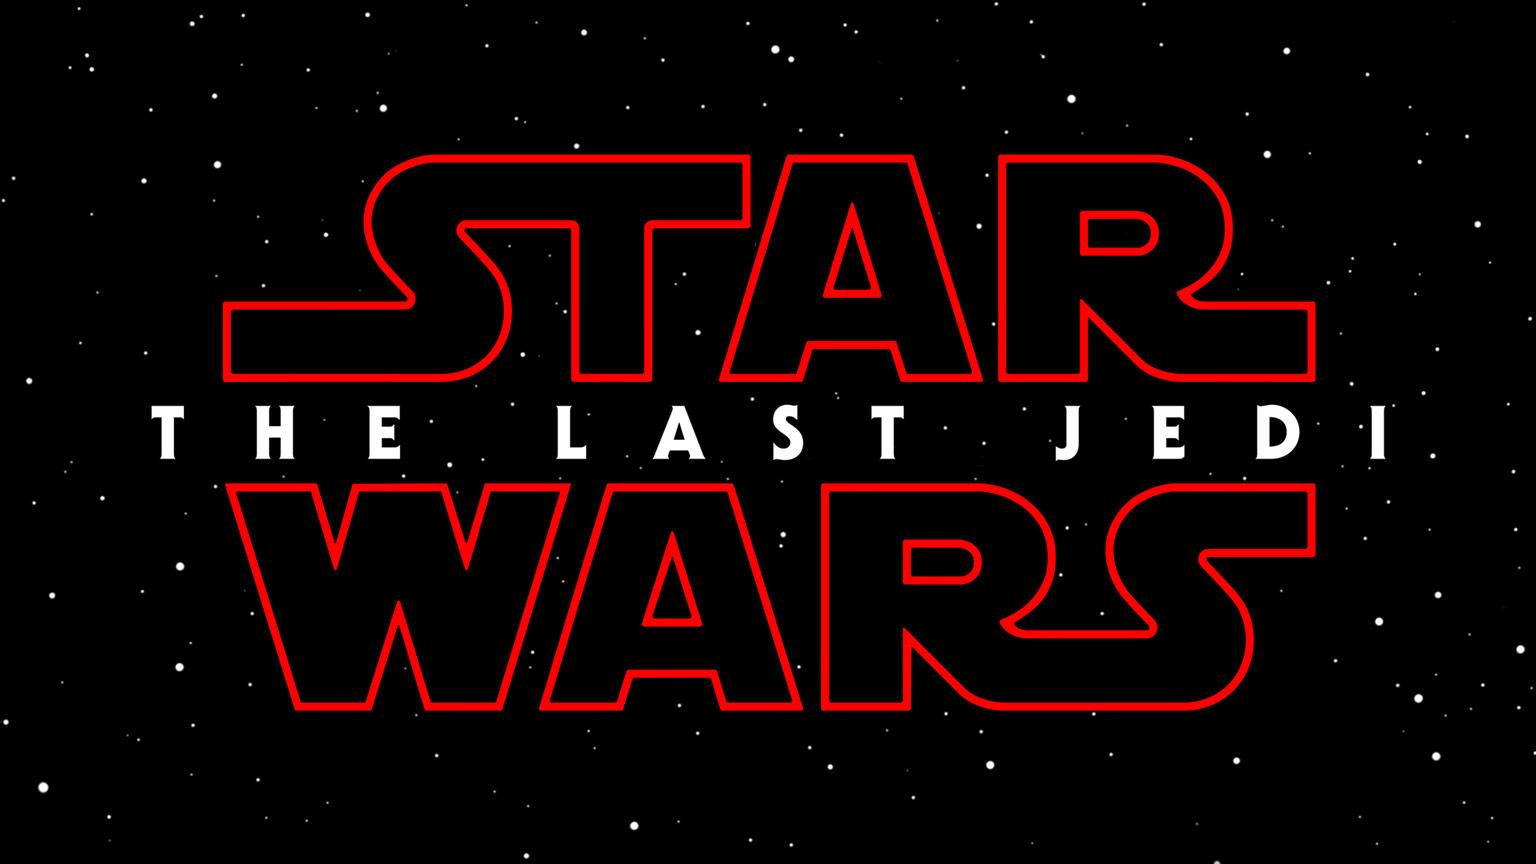 Filmul Star Wars The Last Jedi debuteaza si genereaza foarte multi bani